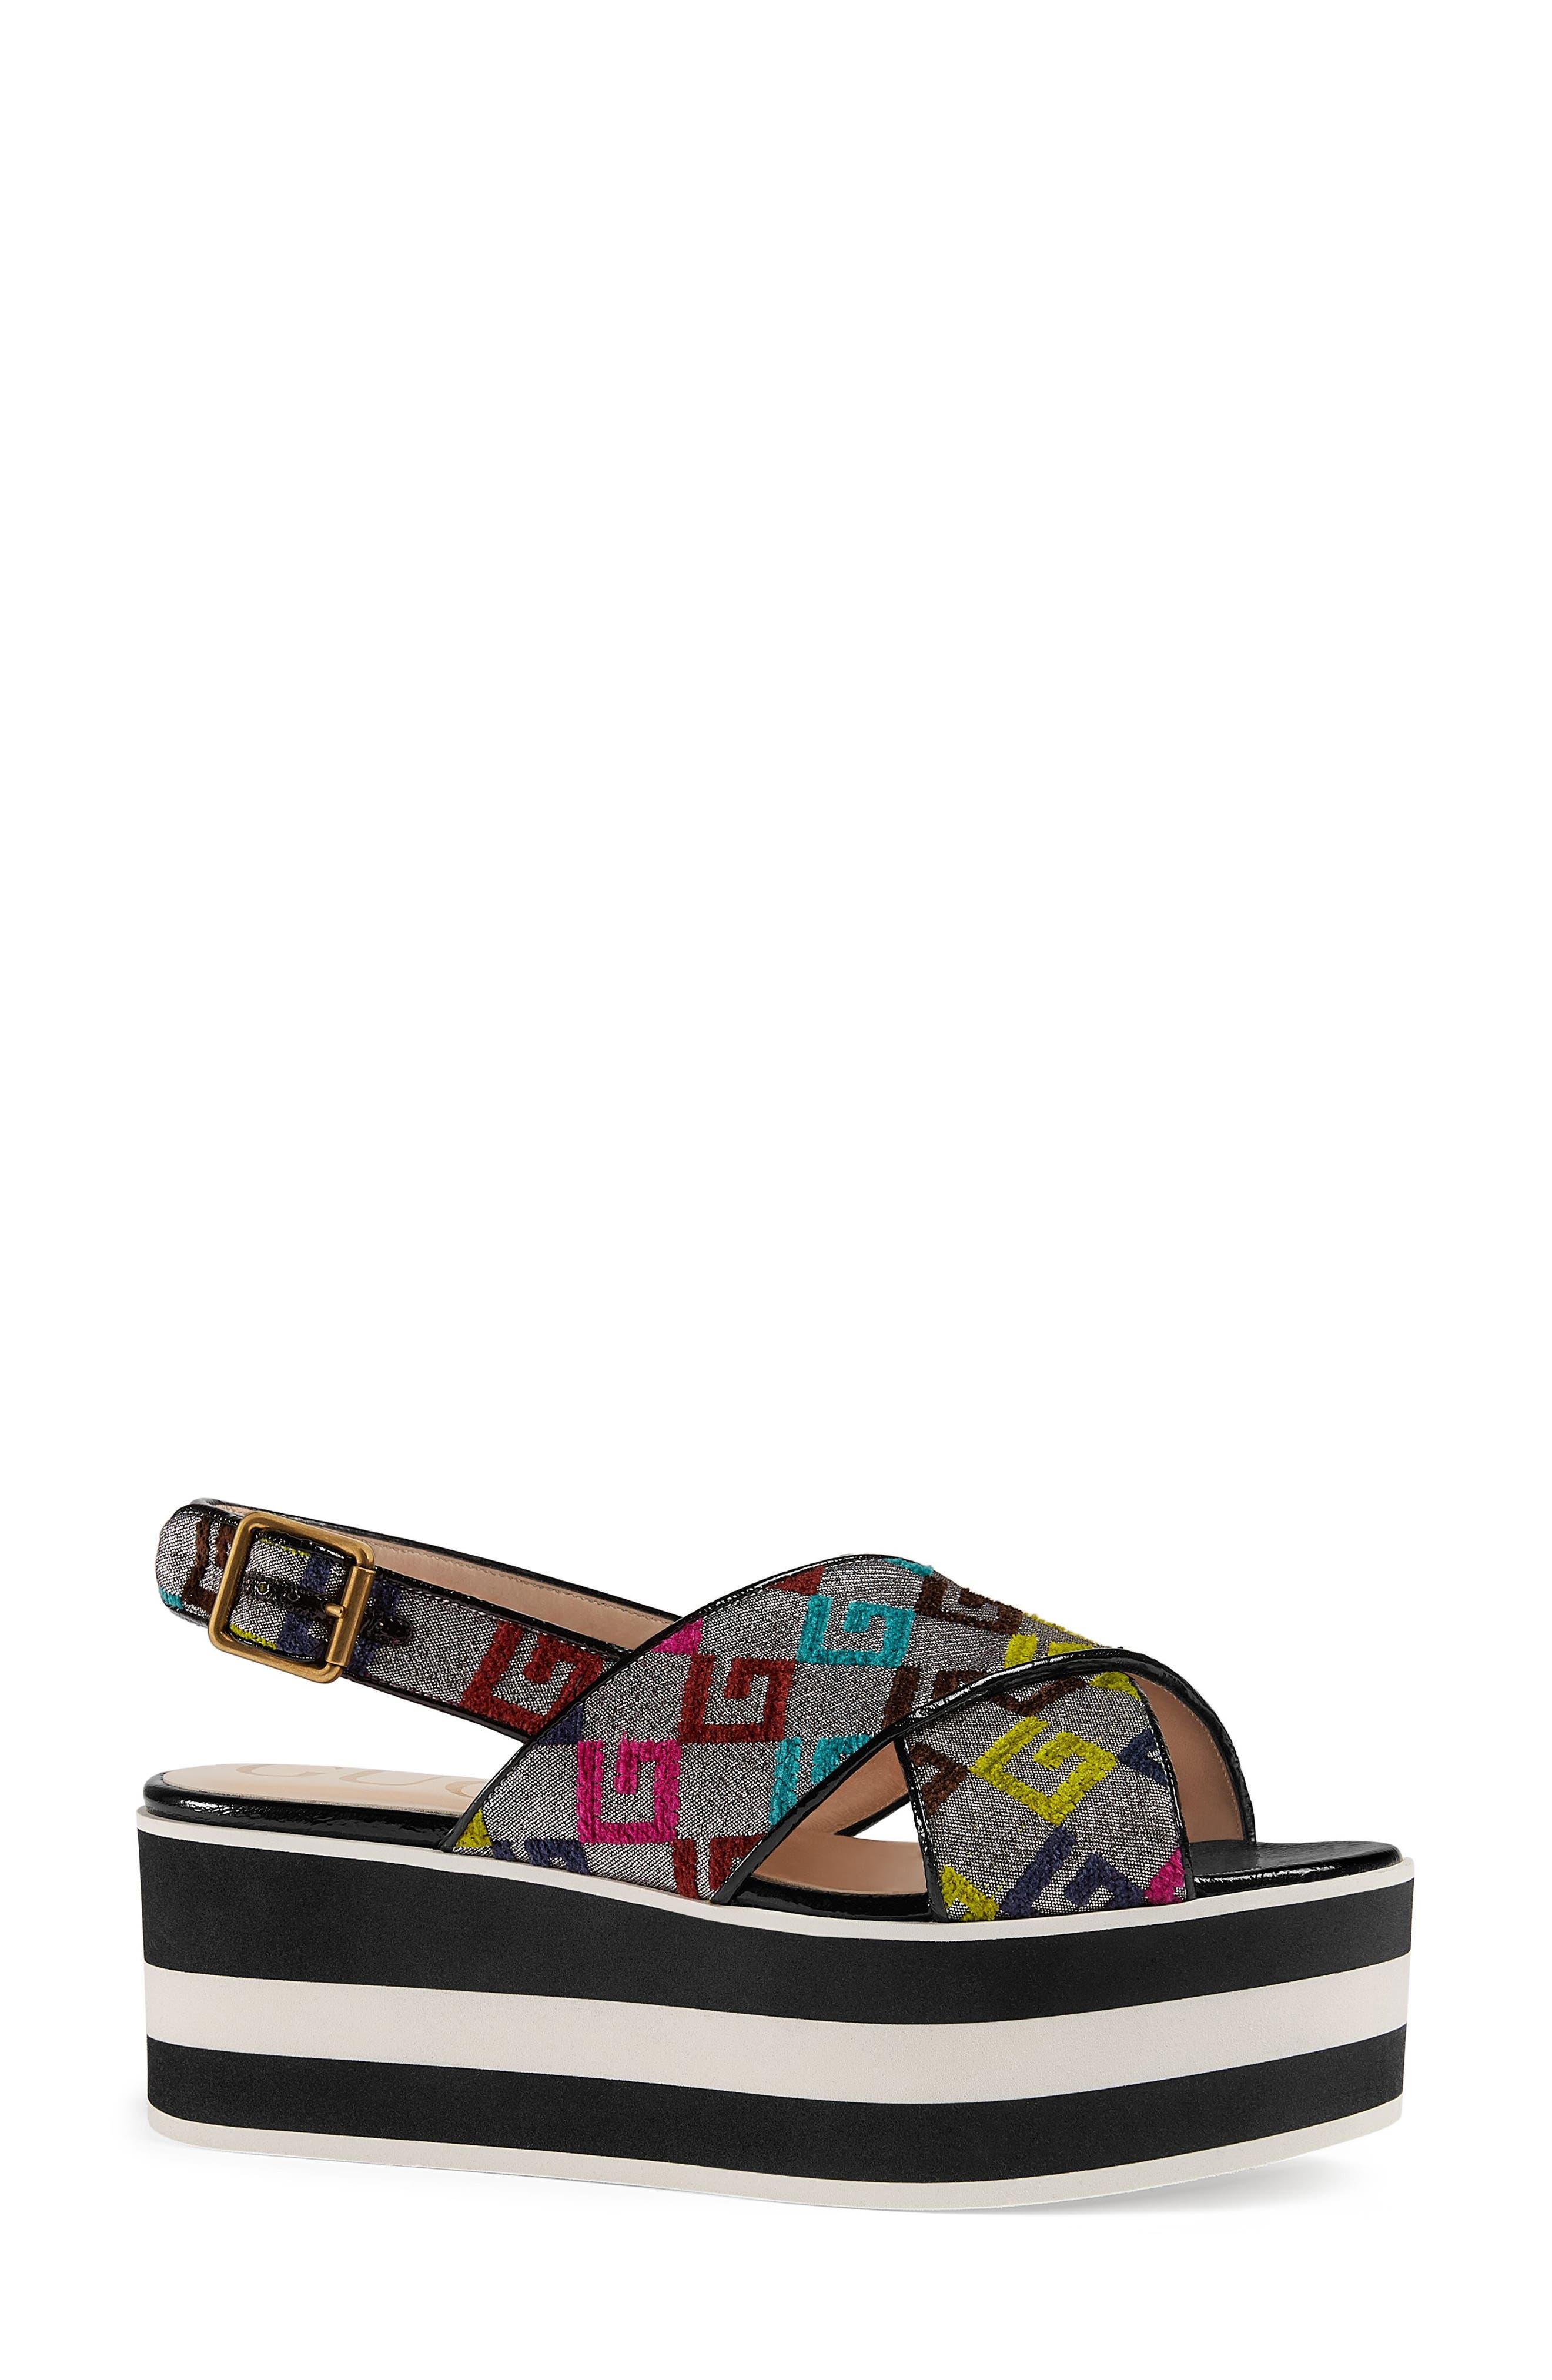 Peggy Flatform Sandal,                         Main,                         color, 047